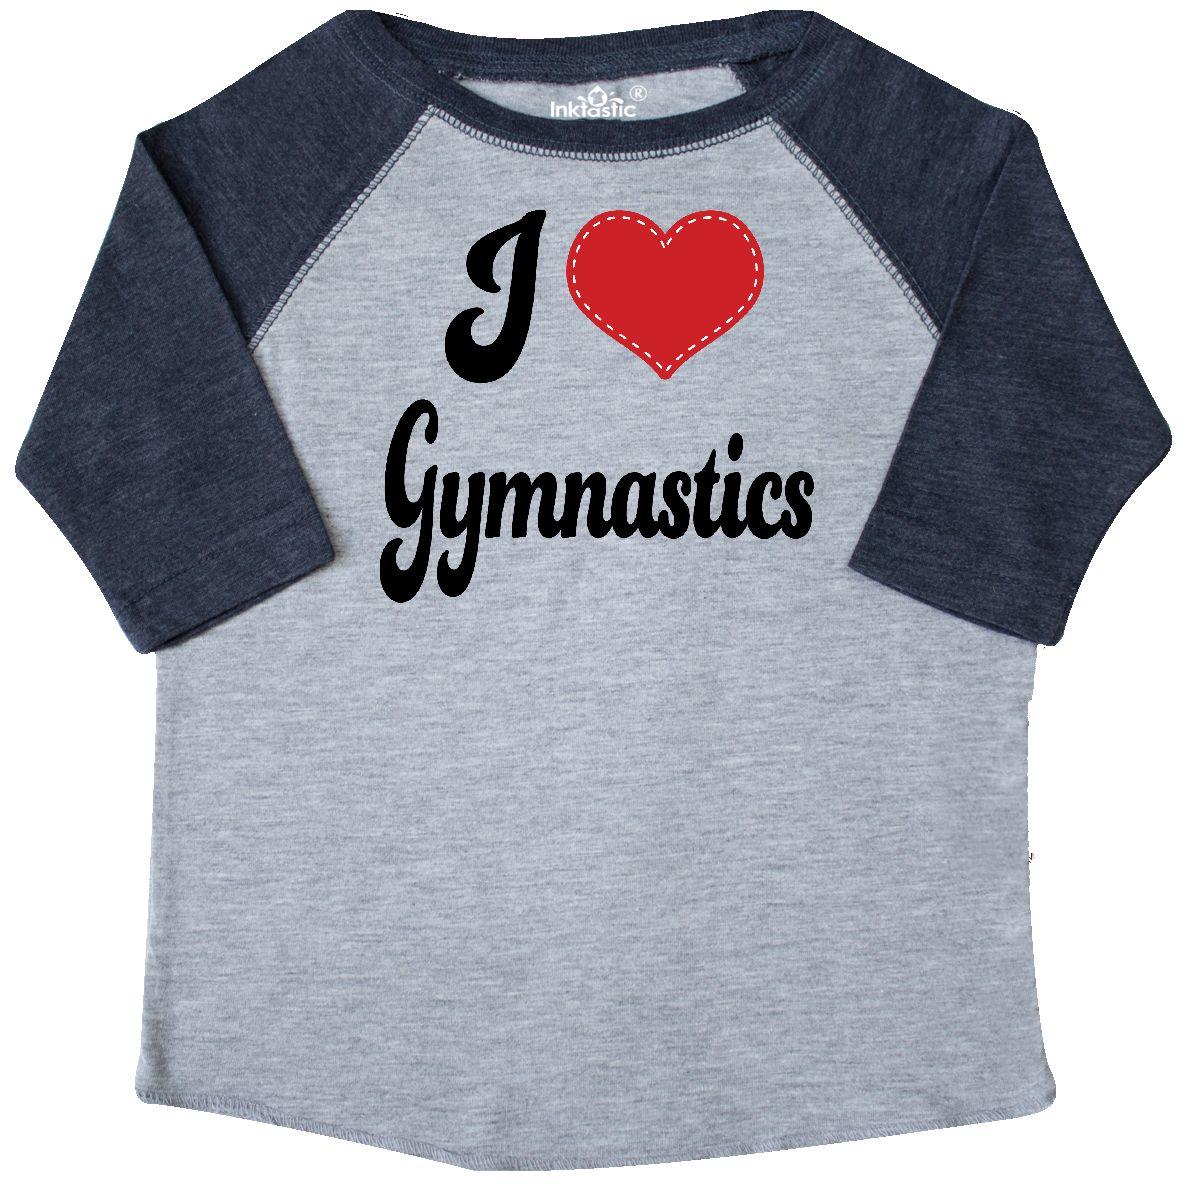 inktastic Gymnastics is My Life Toddler T-Shirt